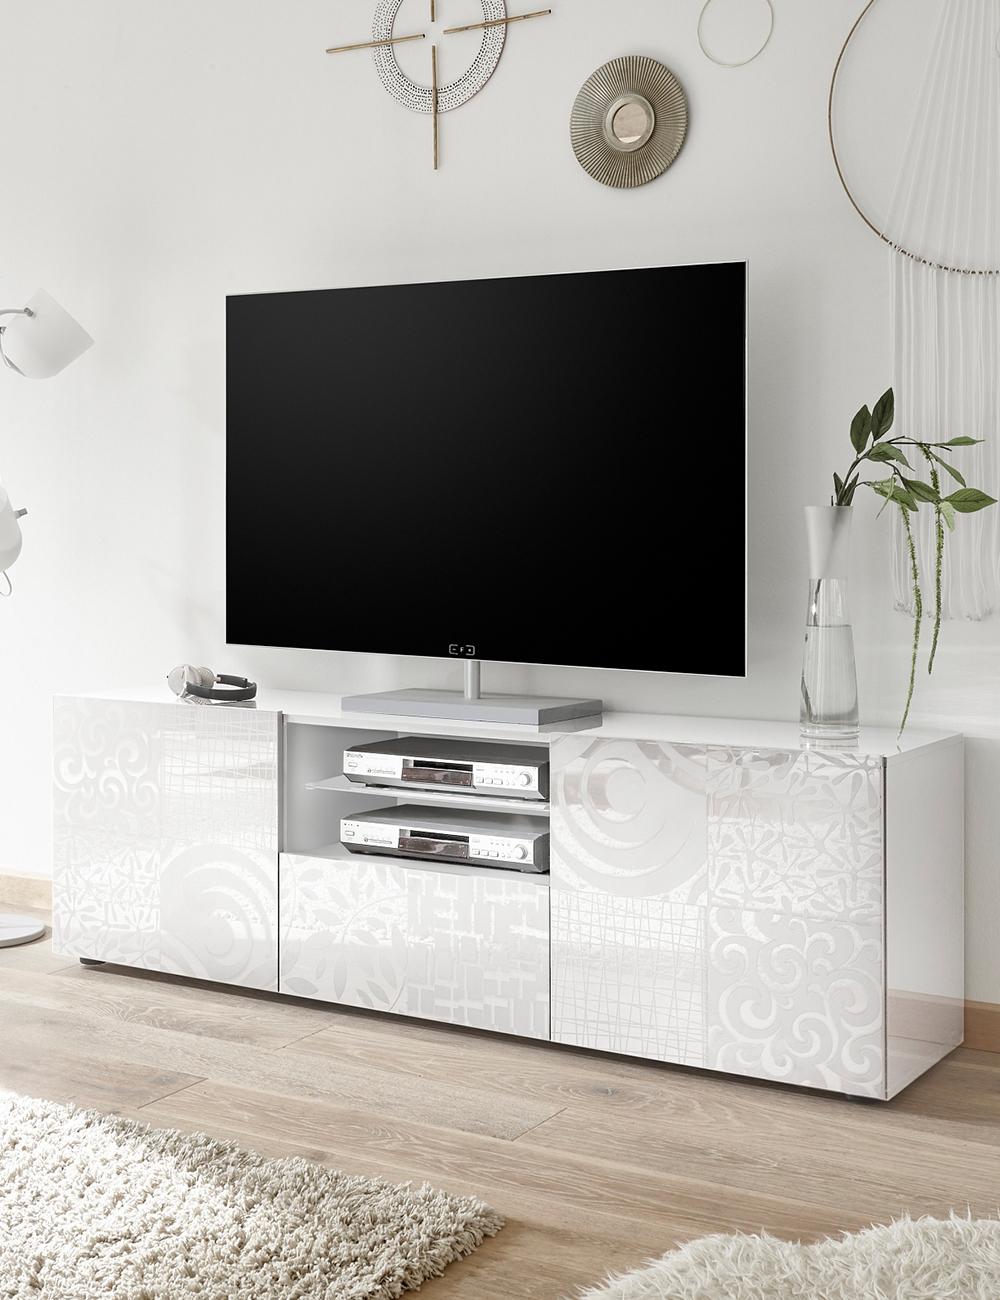 teppich montana patchwork optik grau 160 x 230. Black Bedroom Furniture Sets. Home Design Ideas